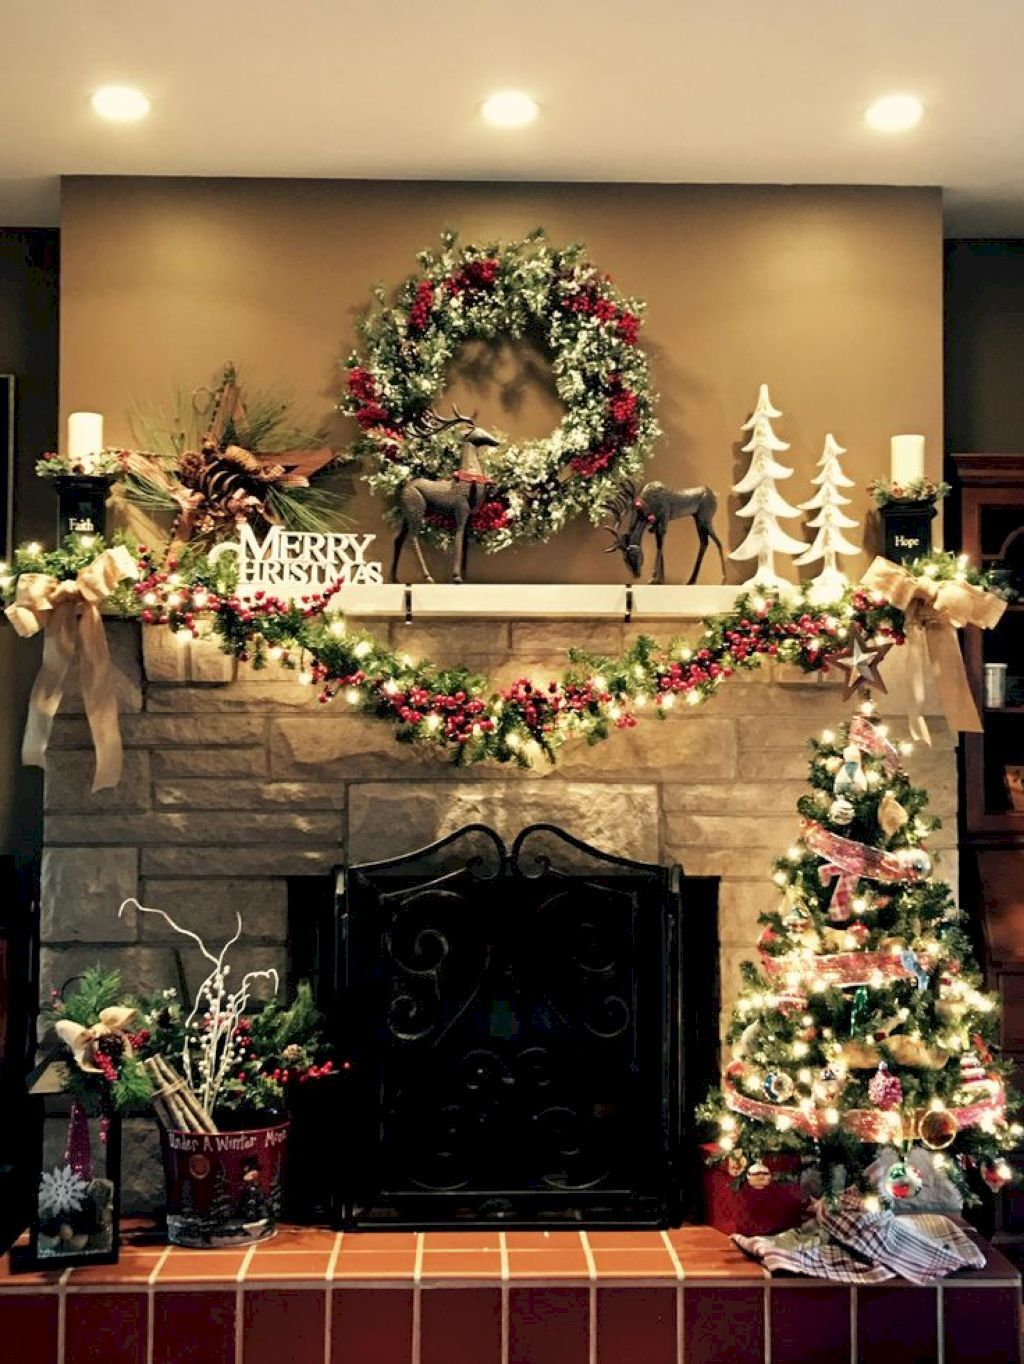 60 Inspiring Christmas Fireplace Decor Ideas images